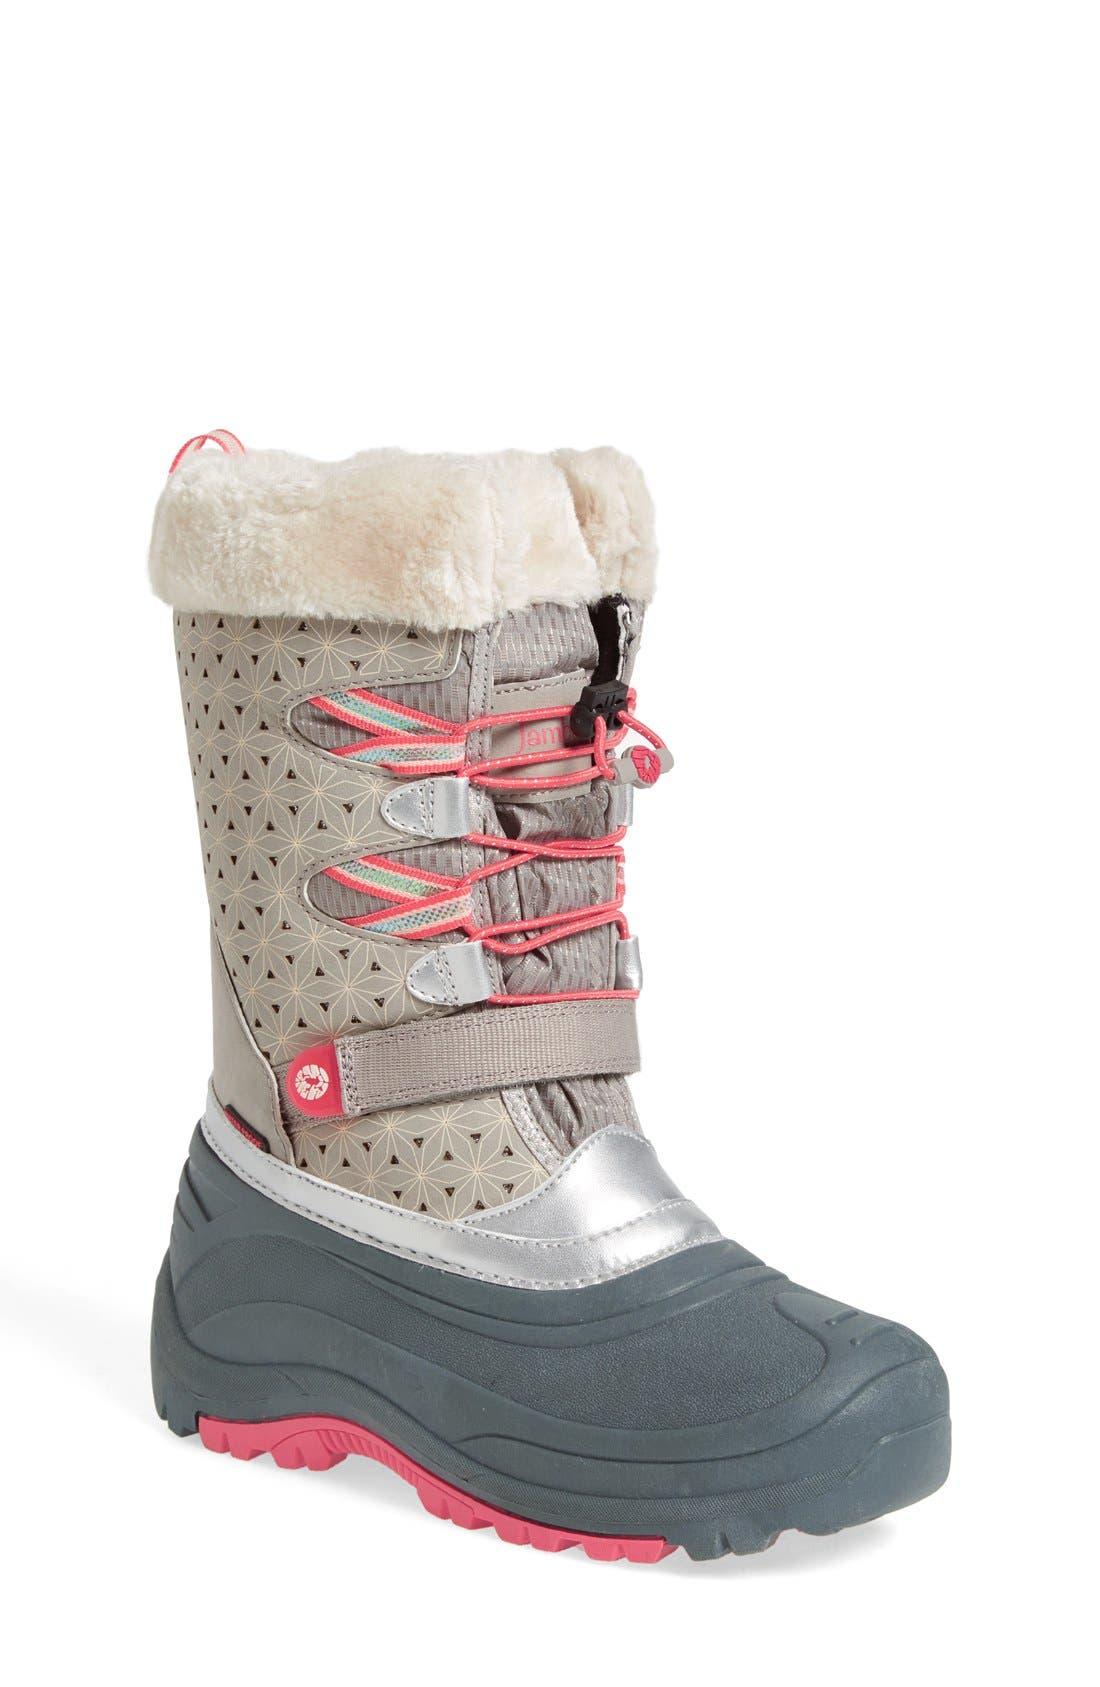 Jambu 'Venom' Waterproof Insulated Snow Boot (Toddler, Little Kid & Big Kid)